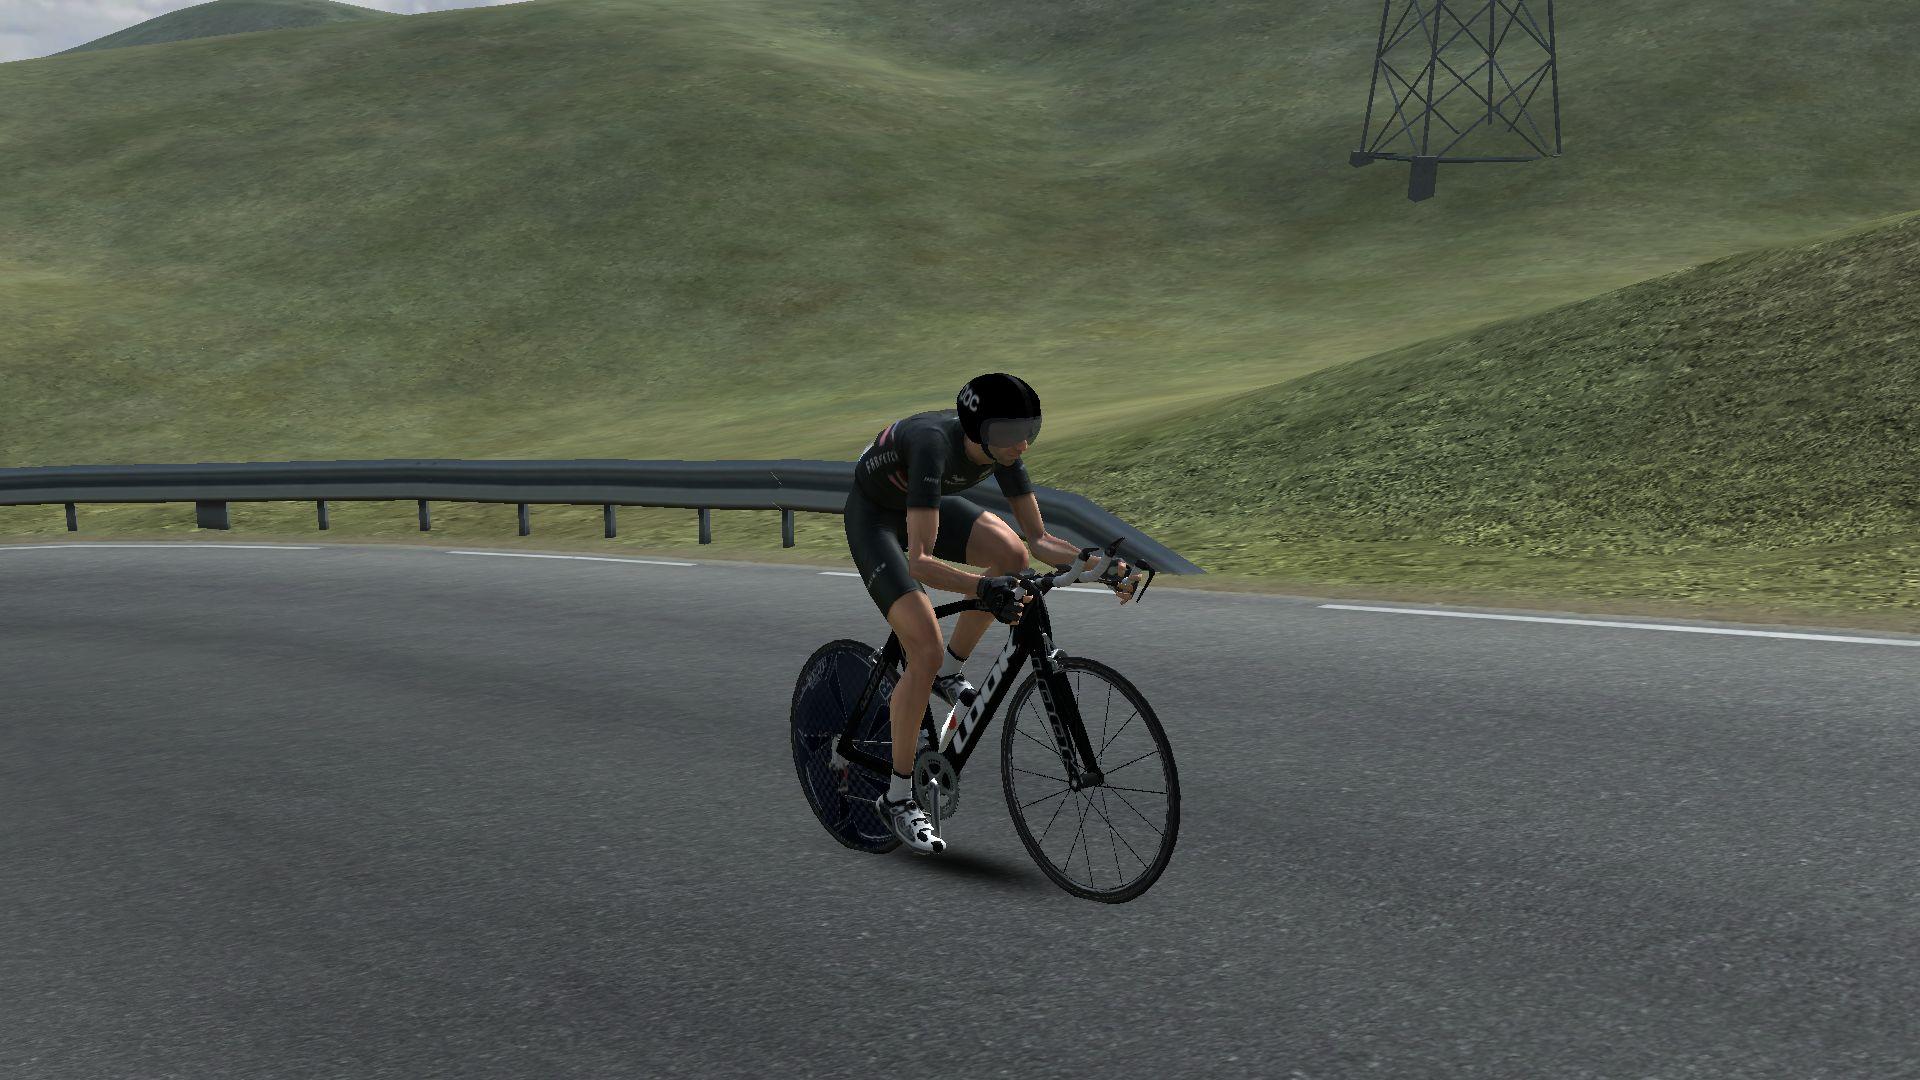 pcmdaily.com/images/mg/2019/Races/GTM/Giro/mg19_giro_09_PCM0030.jpg